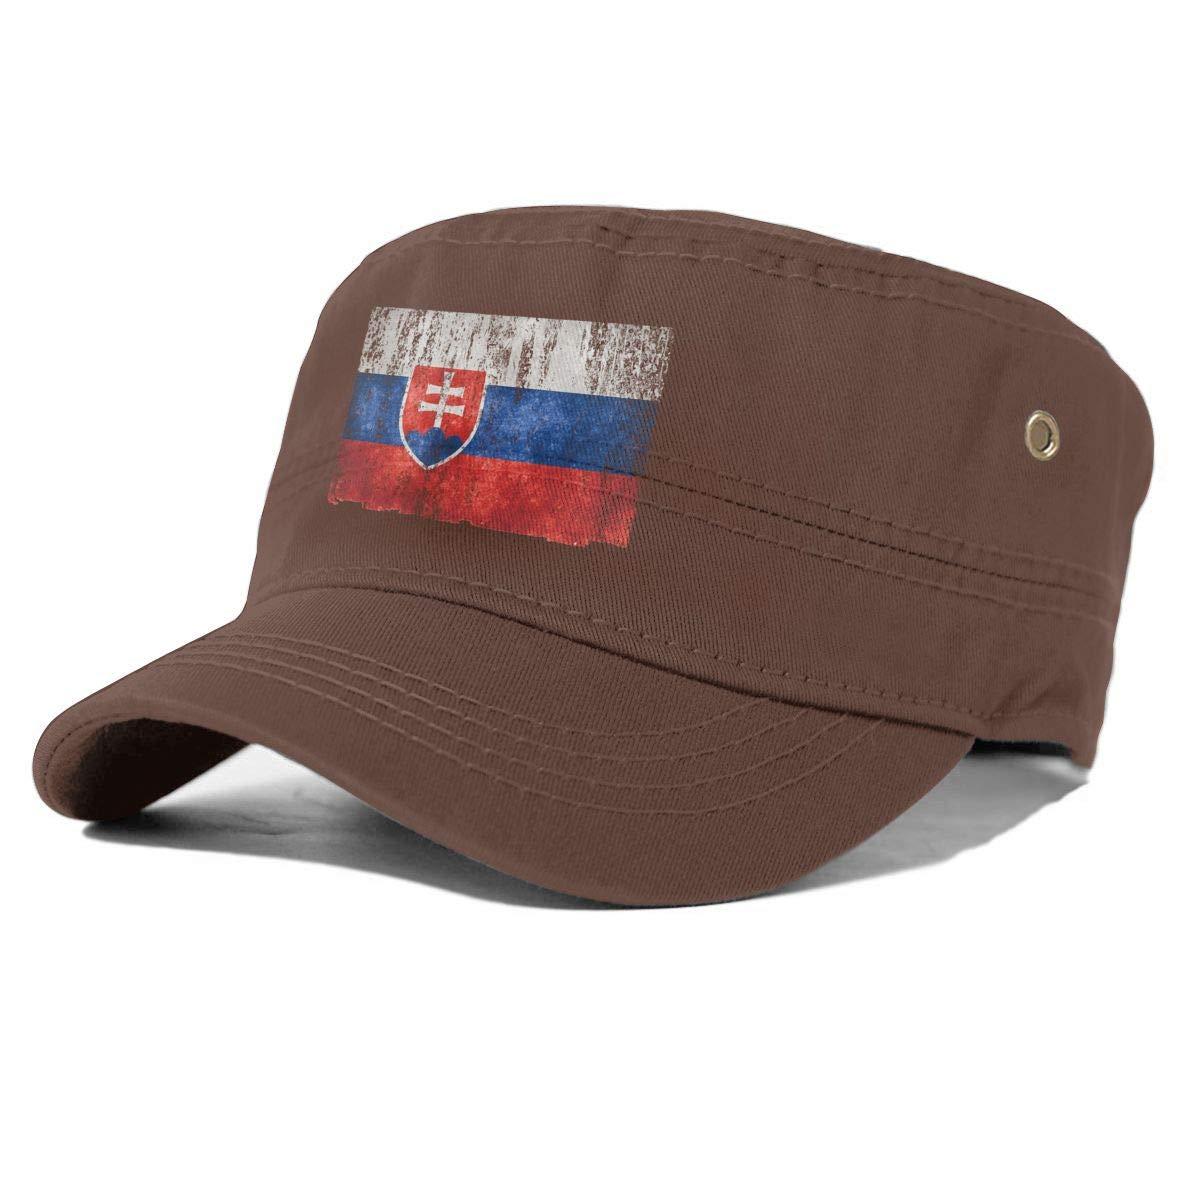 Slovak Flag Unisex Adult Cotton Military Army Cap Flat Top Hat